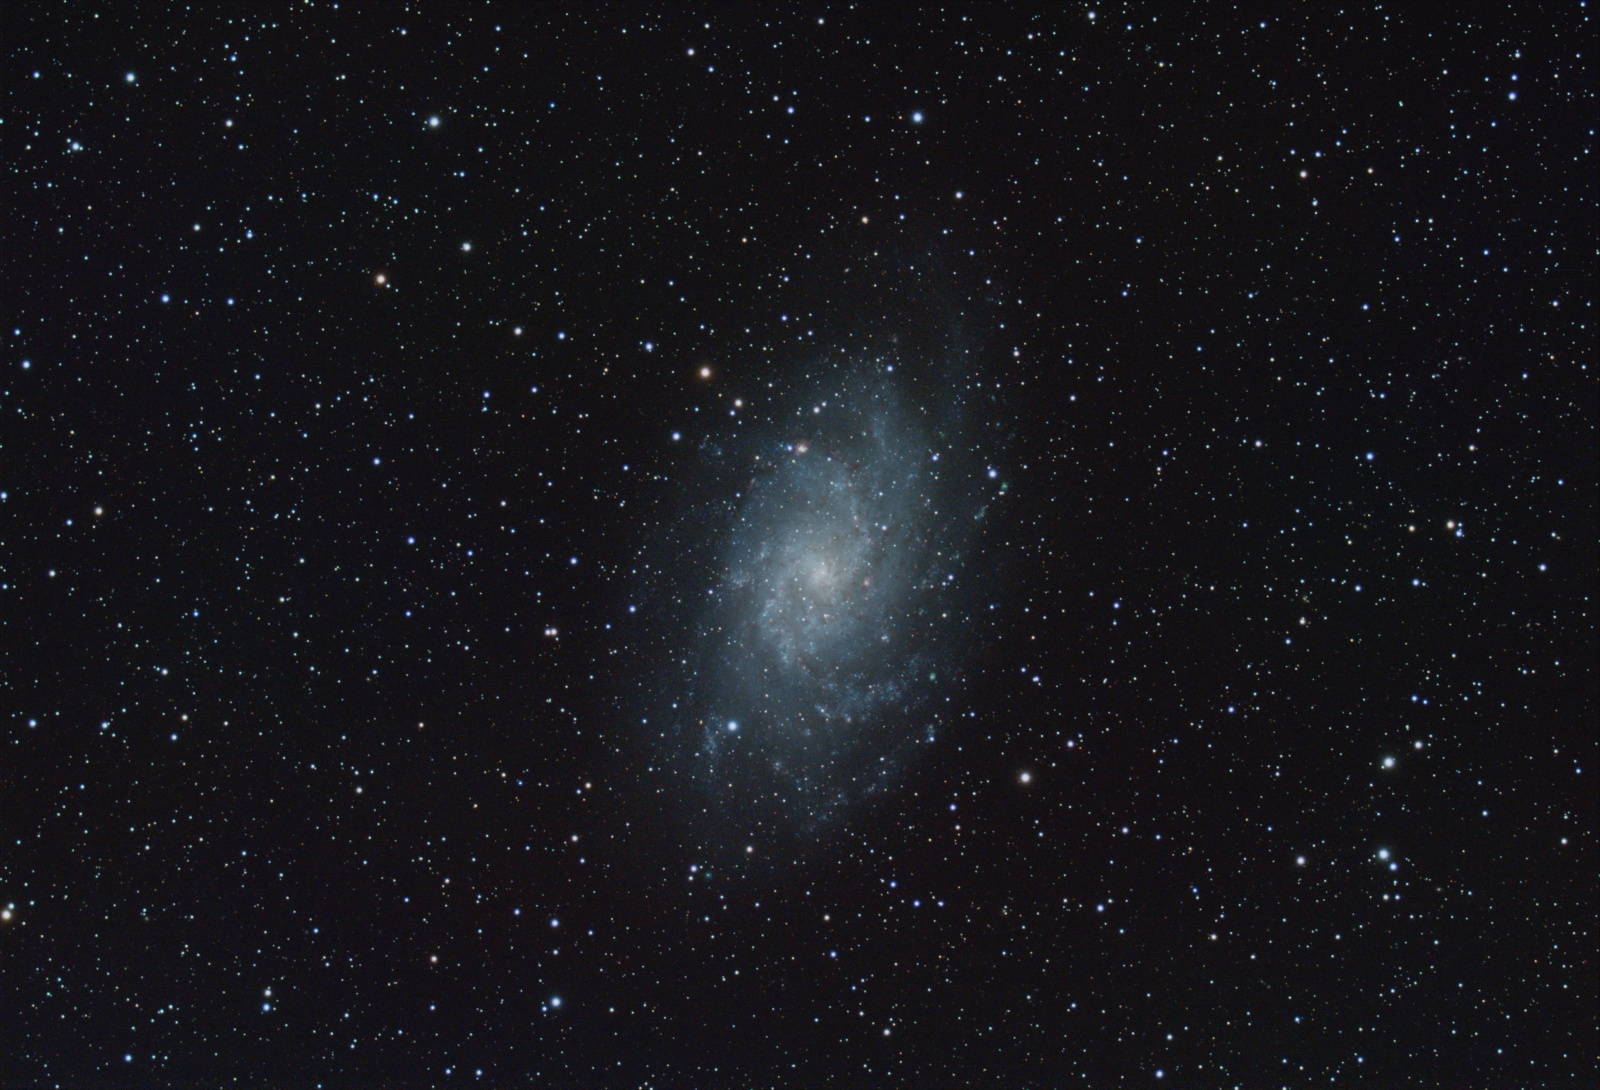 M33.thumb.jpg.d5417fae0e6108f15127a180093789cd.jpg